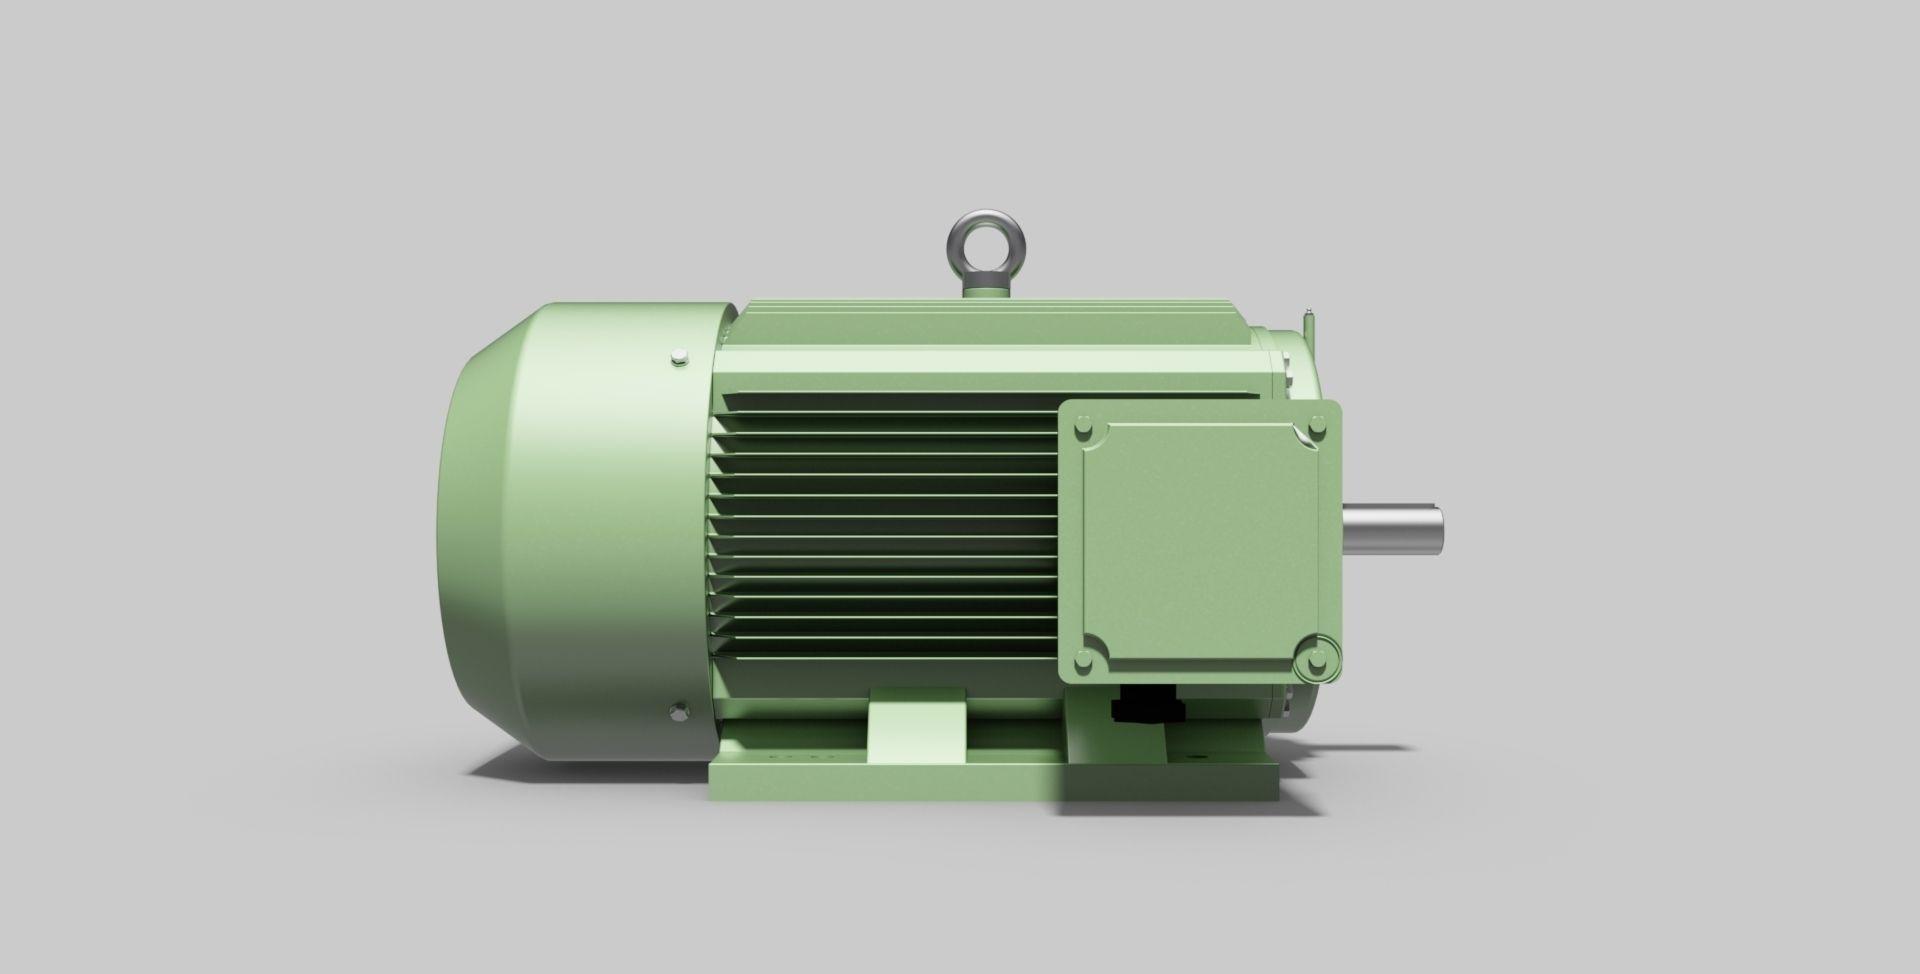 315M-B3 Left 2-Pole - Electric Motor - Free 3D CAD Model